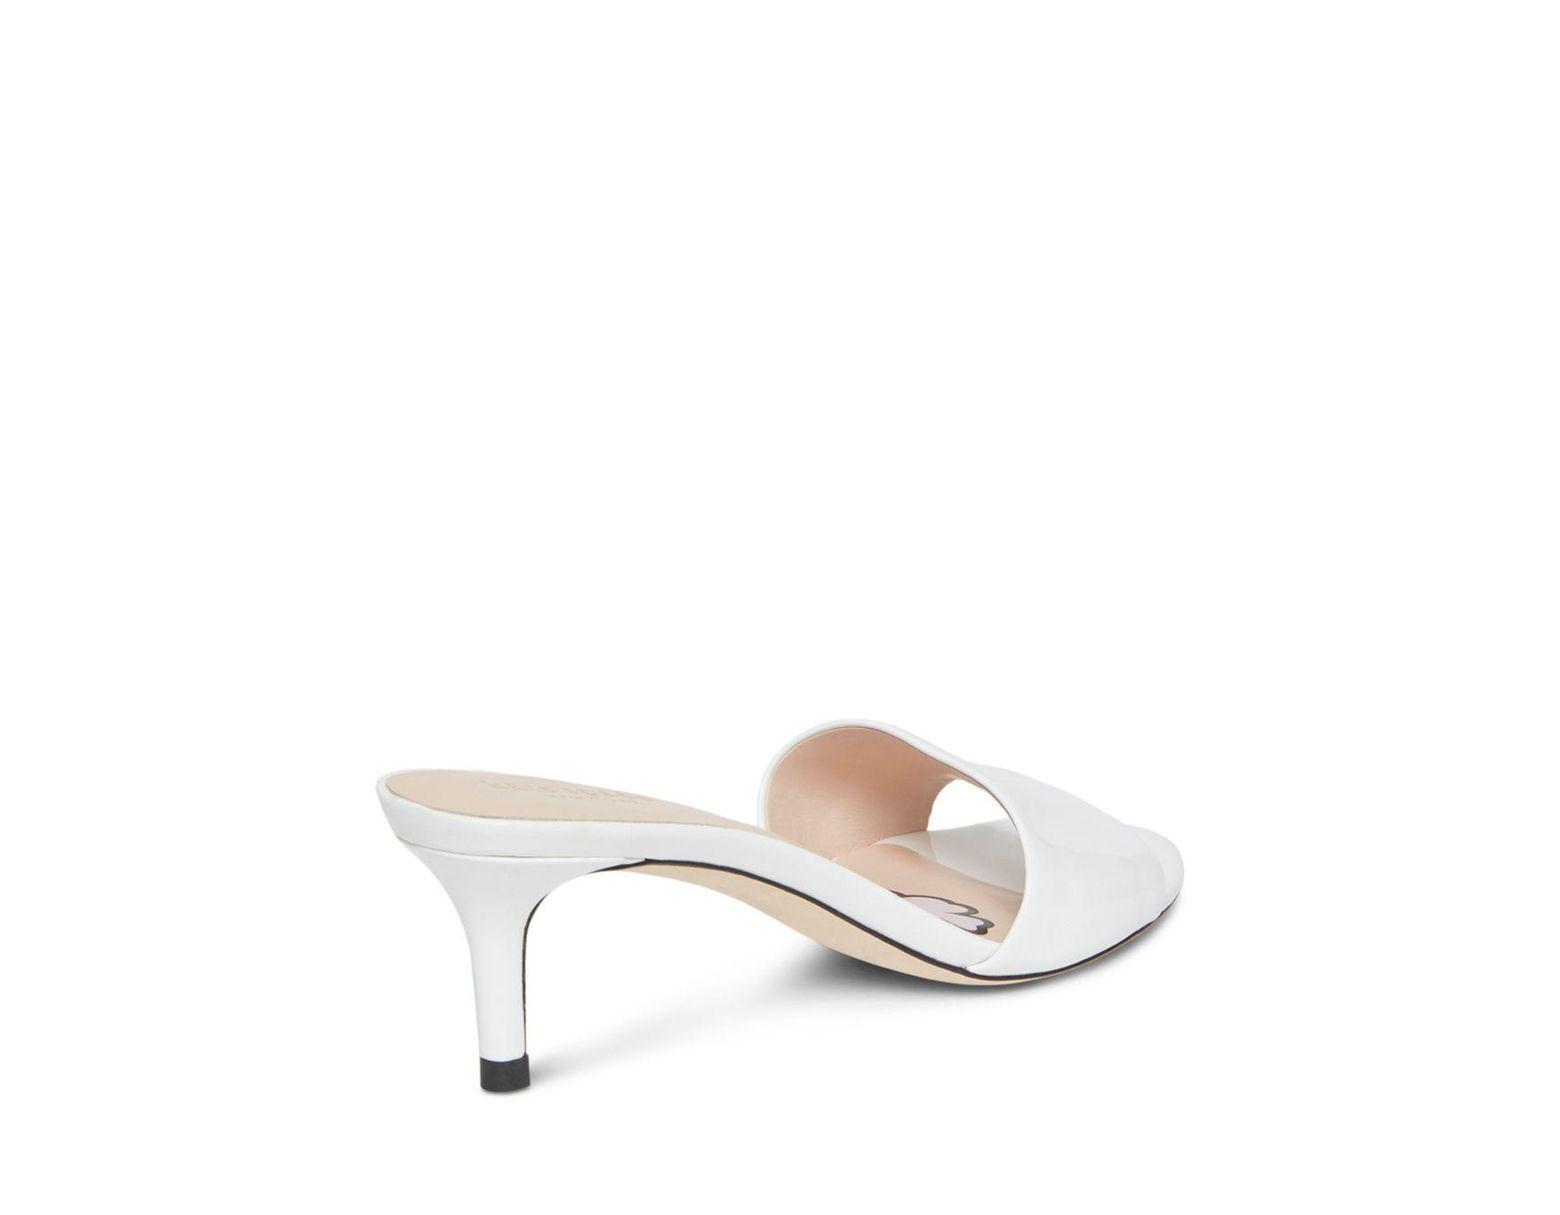 c4f46db8f Kate Spade Women's Savvi Kitten Heel Slide Sandals in White - Lyst